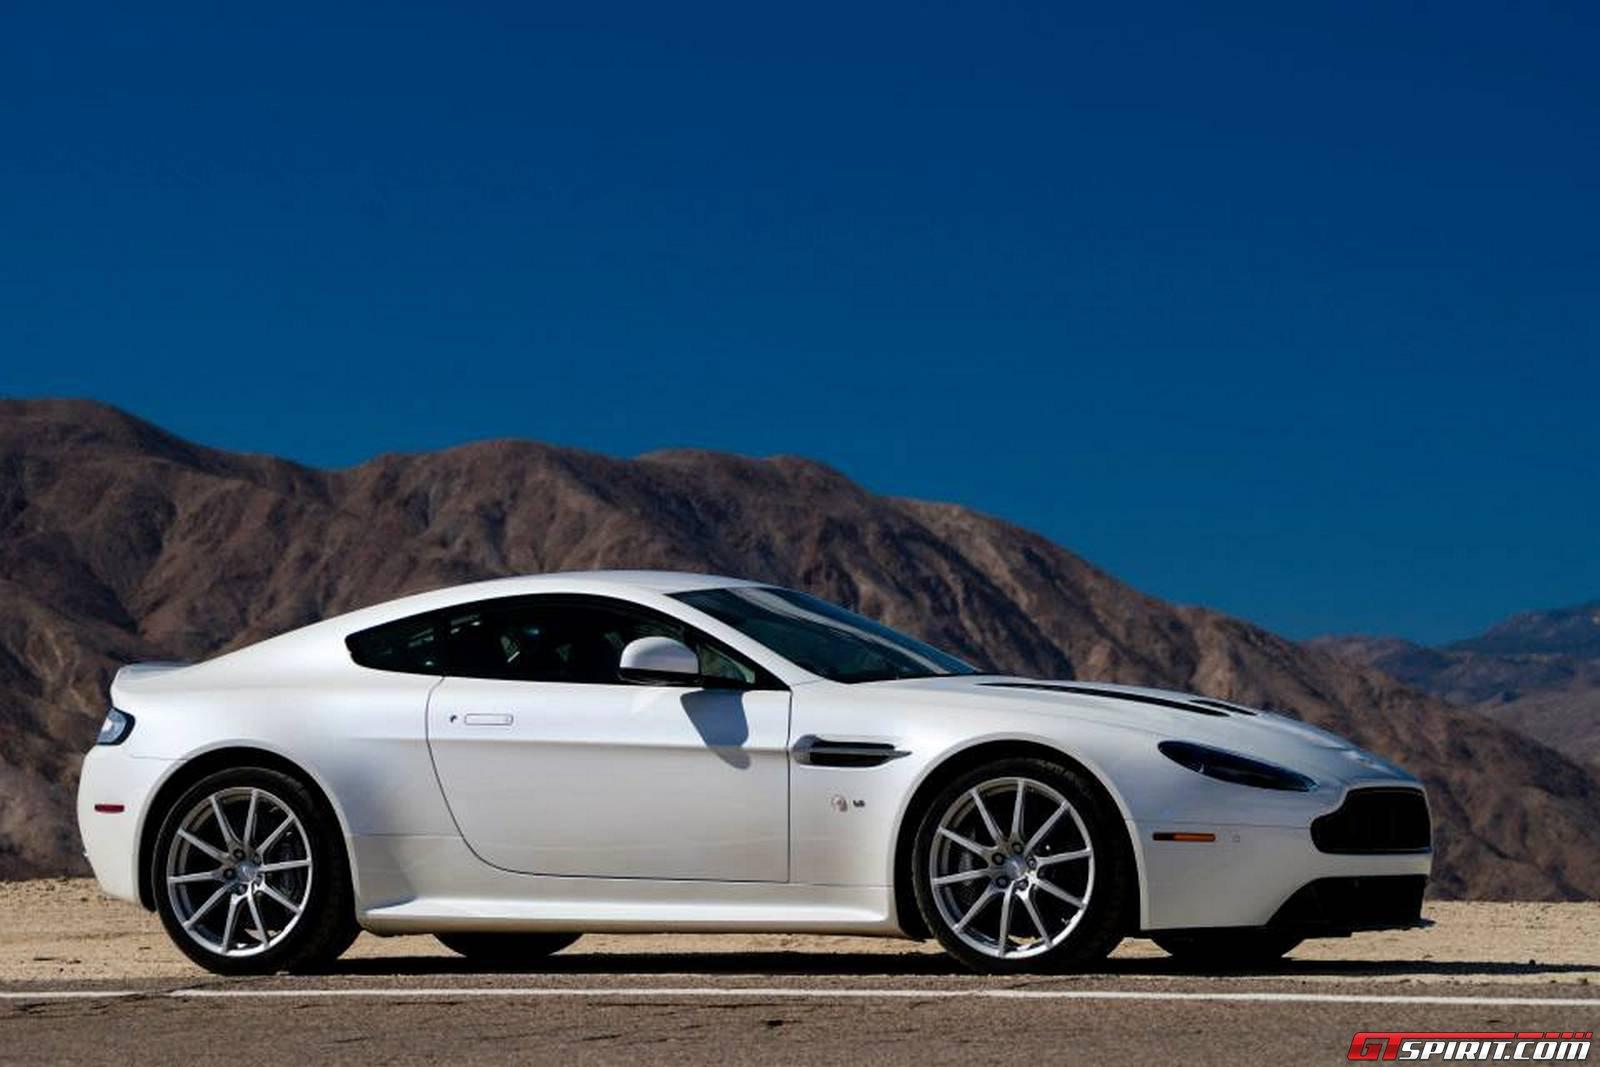 White Aston Martin V12 Vantage S In Palm Springs California Gtspirit